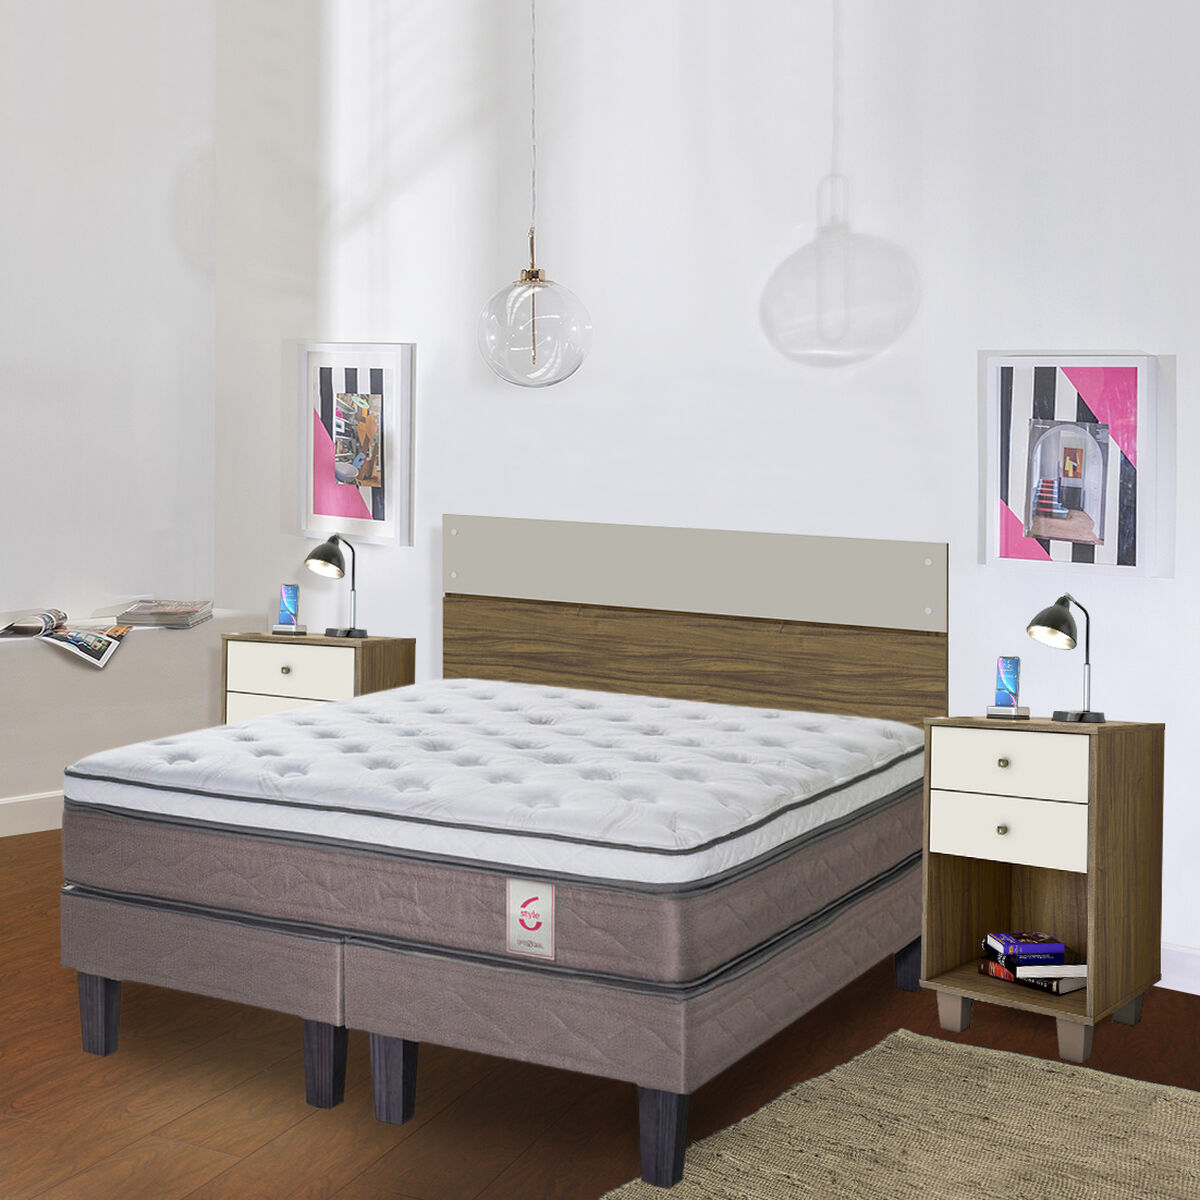 Combo Cama Europea Rosen Base Dividida 2 Plazas New Style 6 + Set Maderas Combinare Nogal